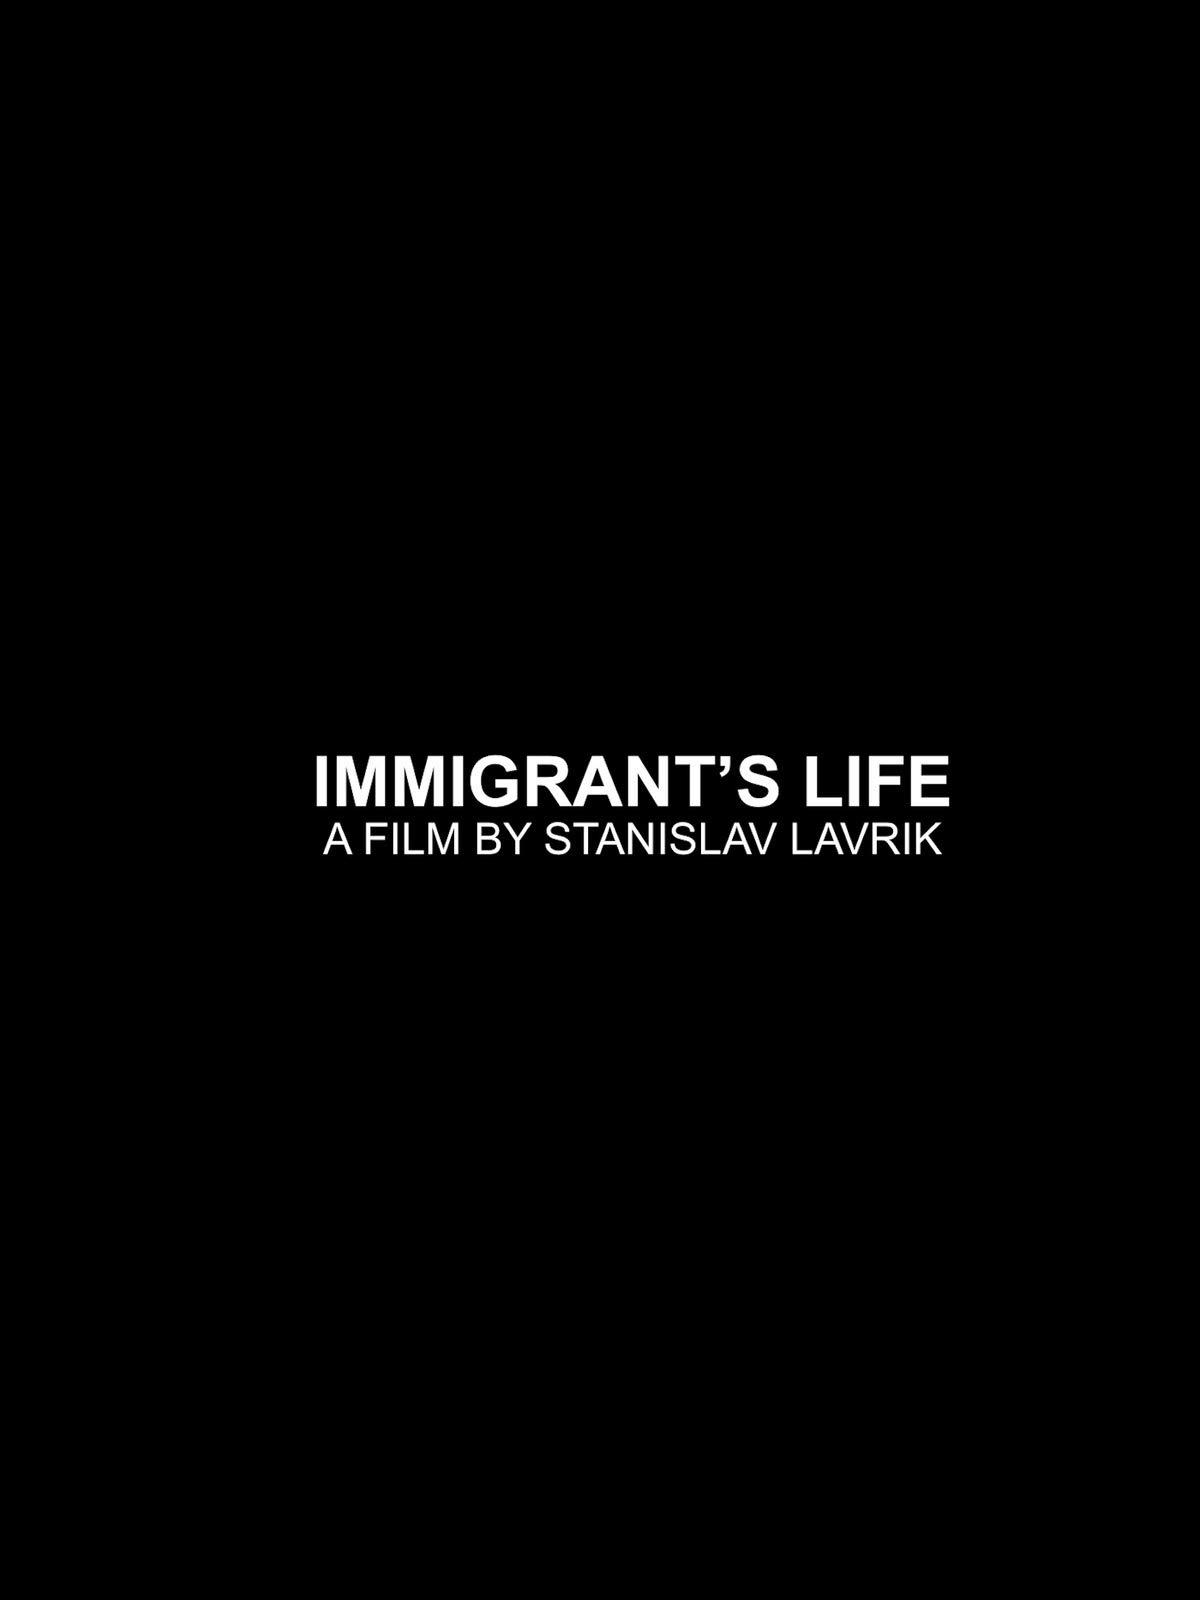 Immigrant's Life